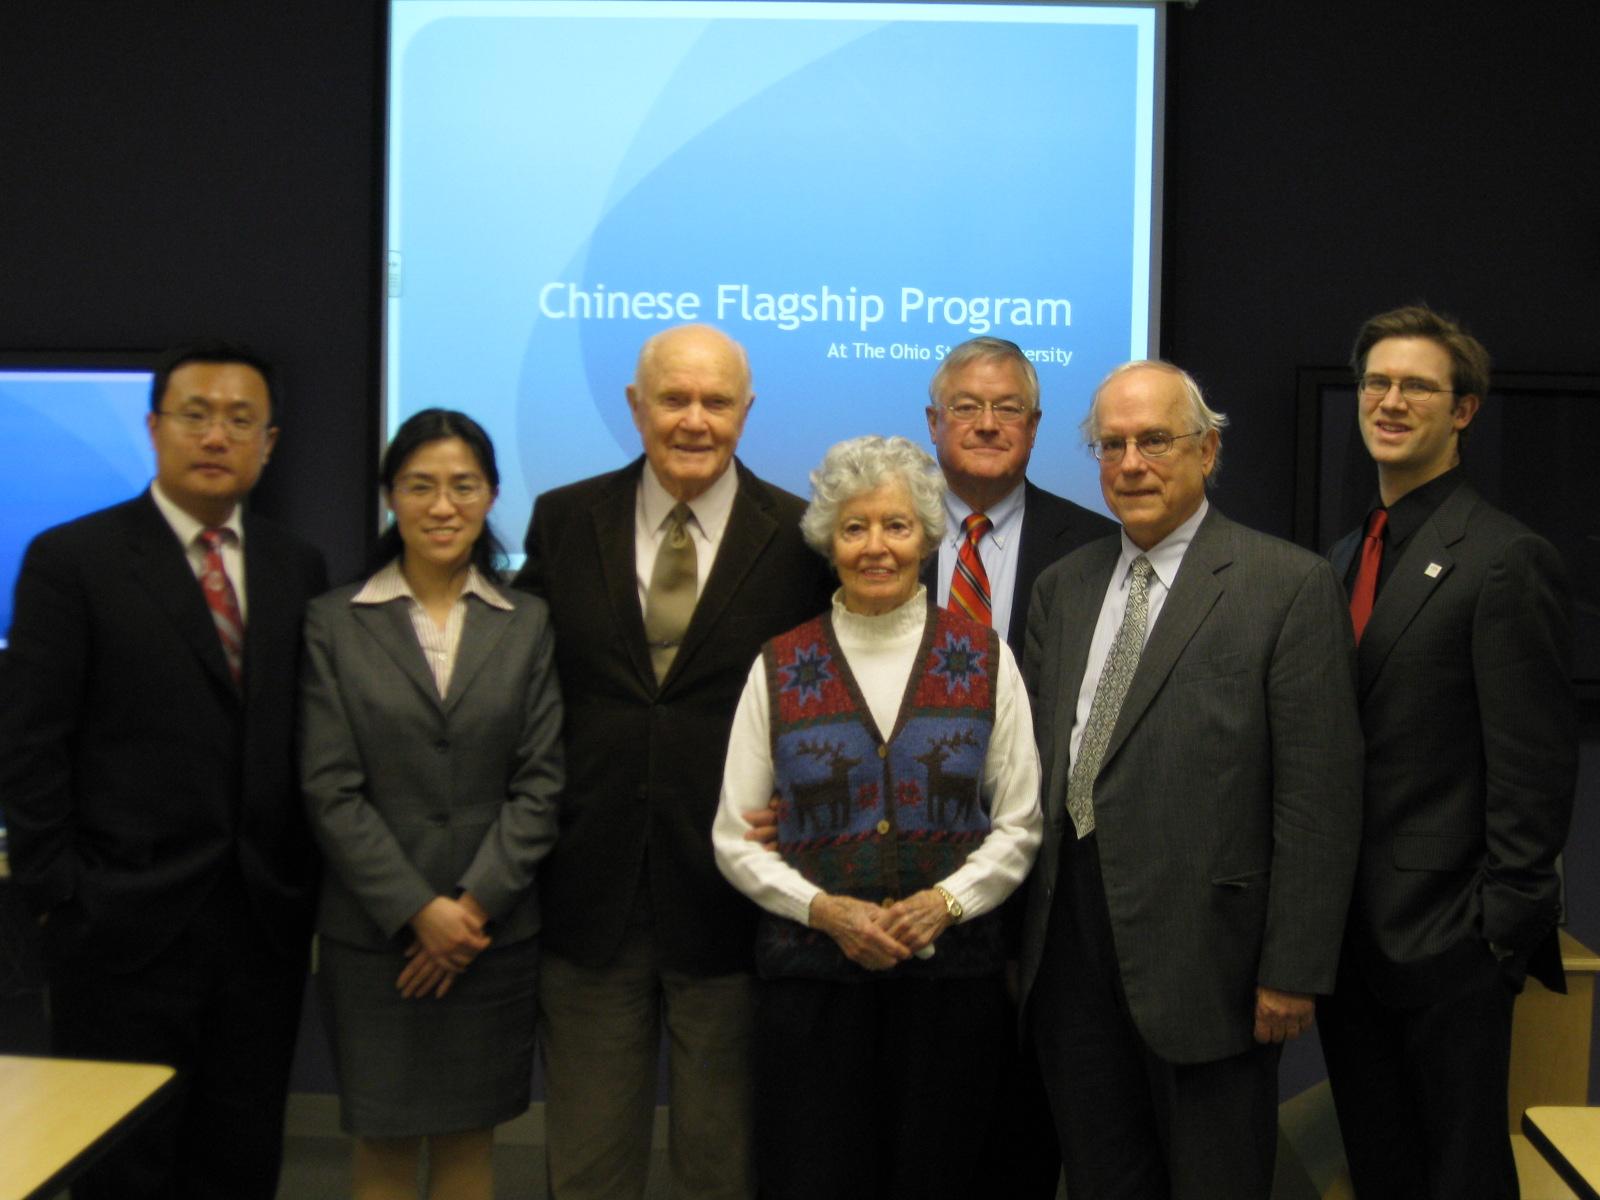 John & Annie Glenn visited Chinese Flagship